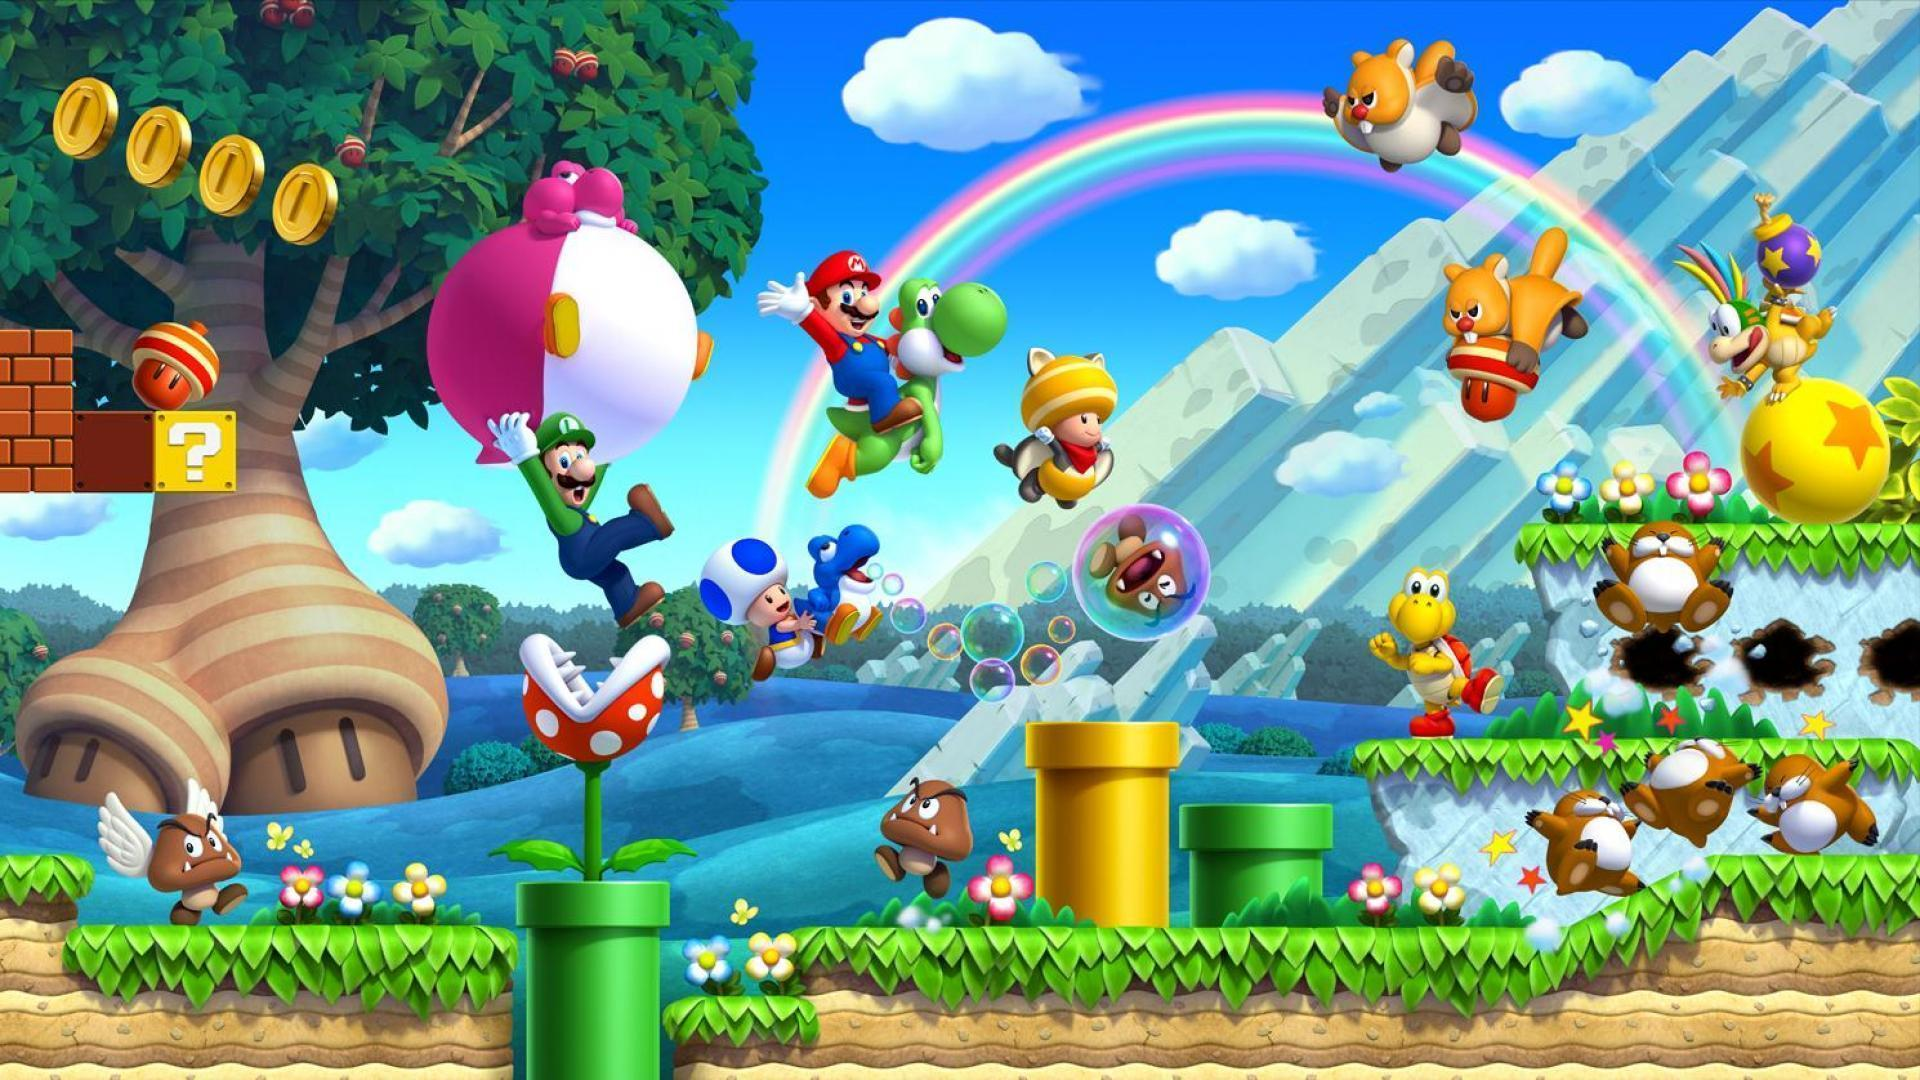 Super Mario Desktop Wallpaper (Wii U)